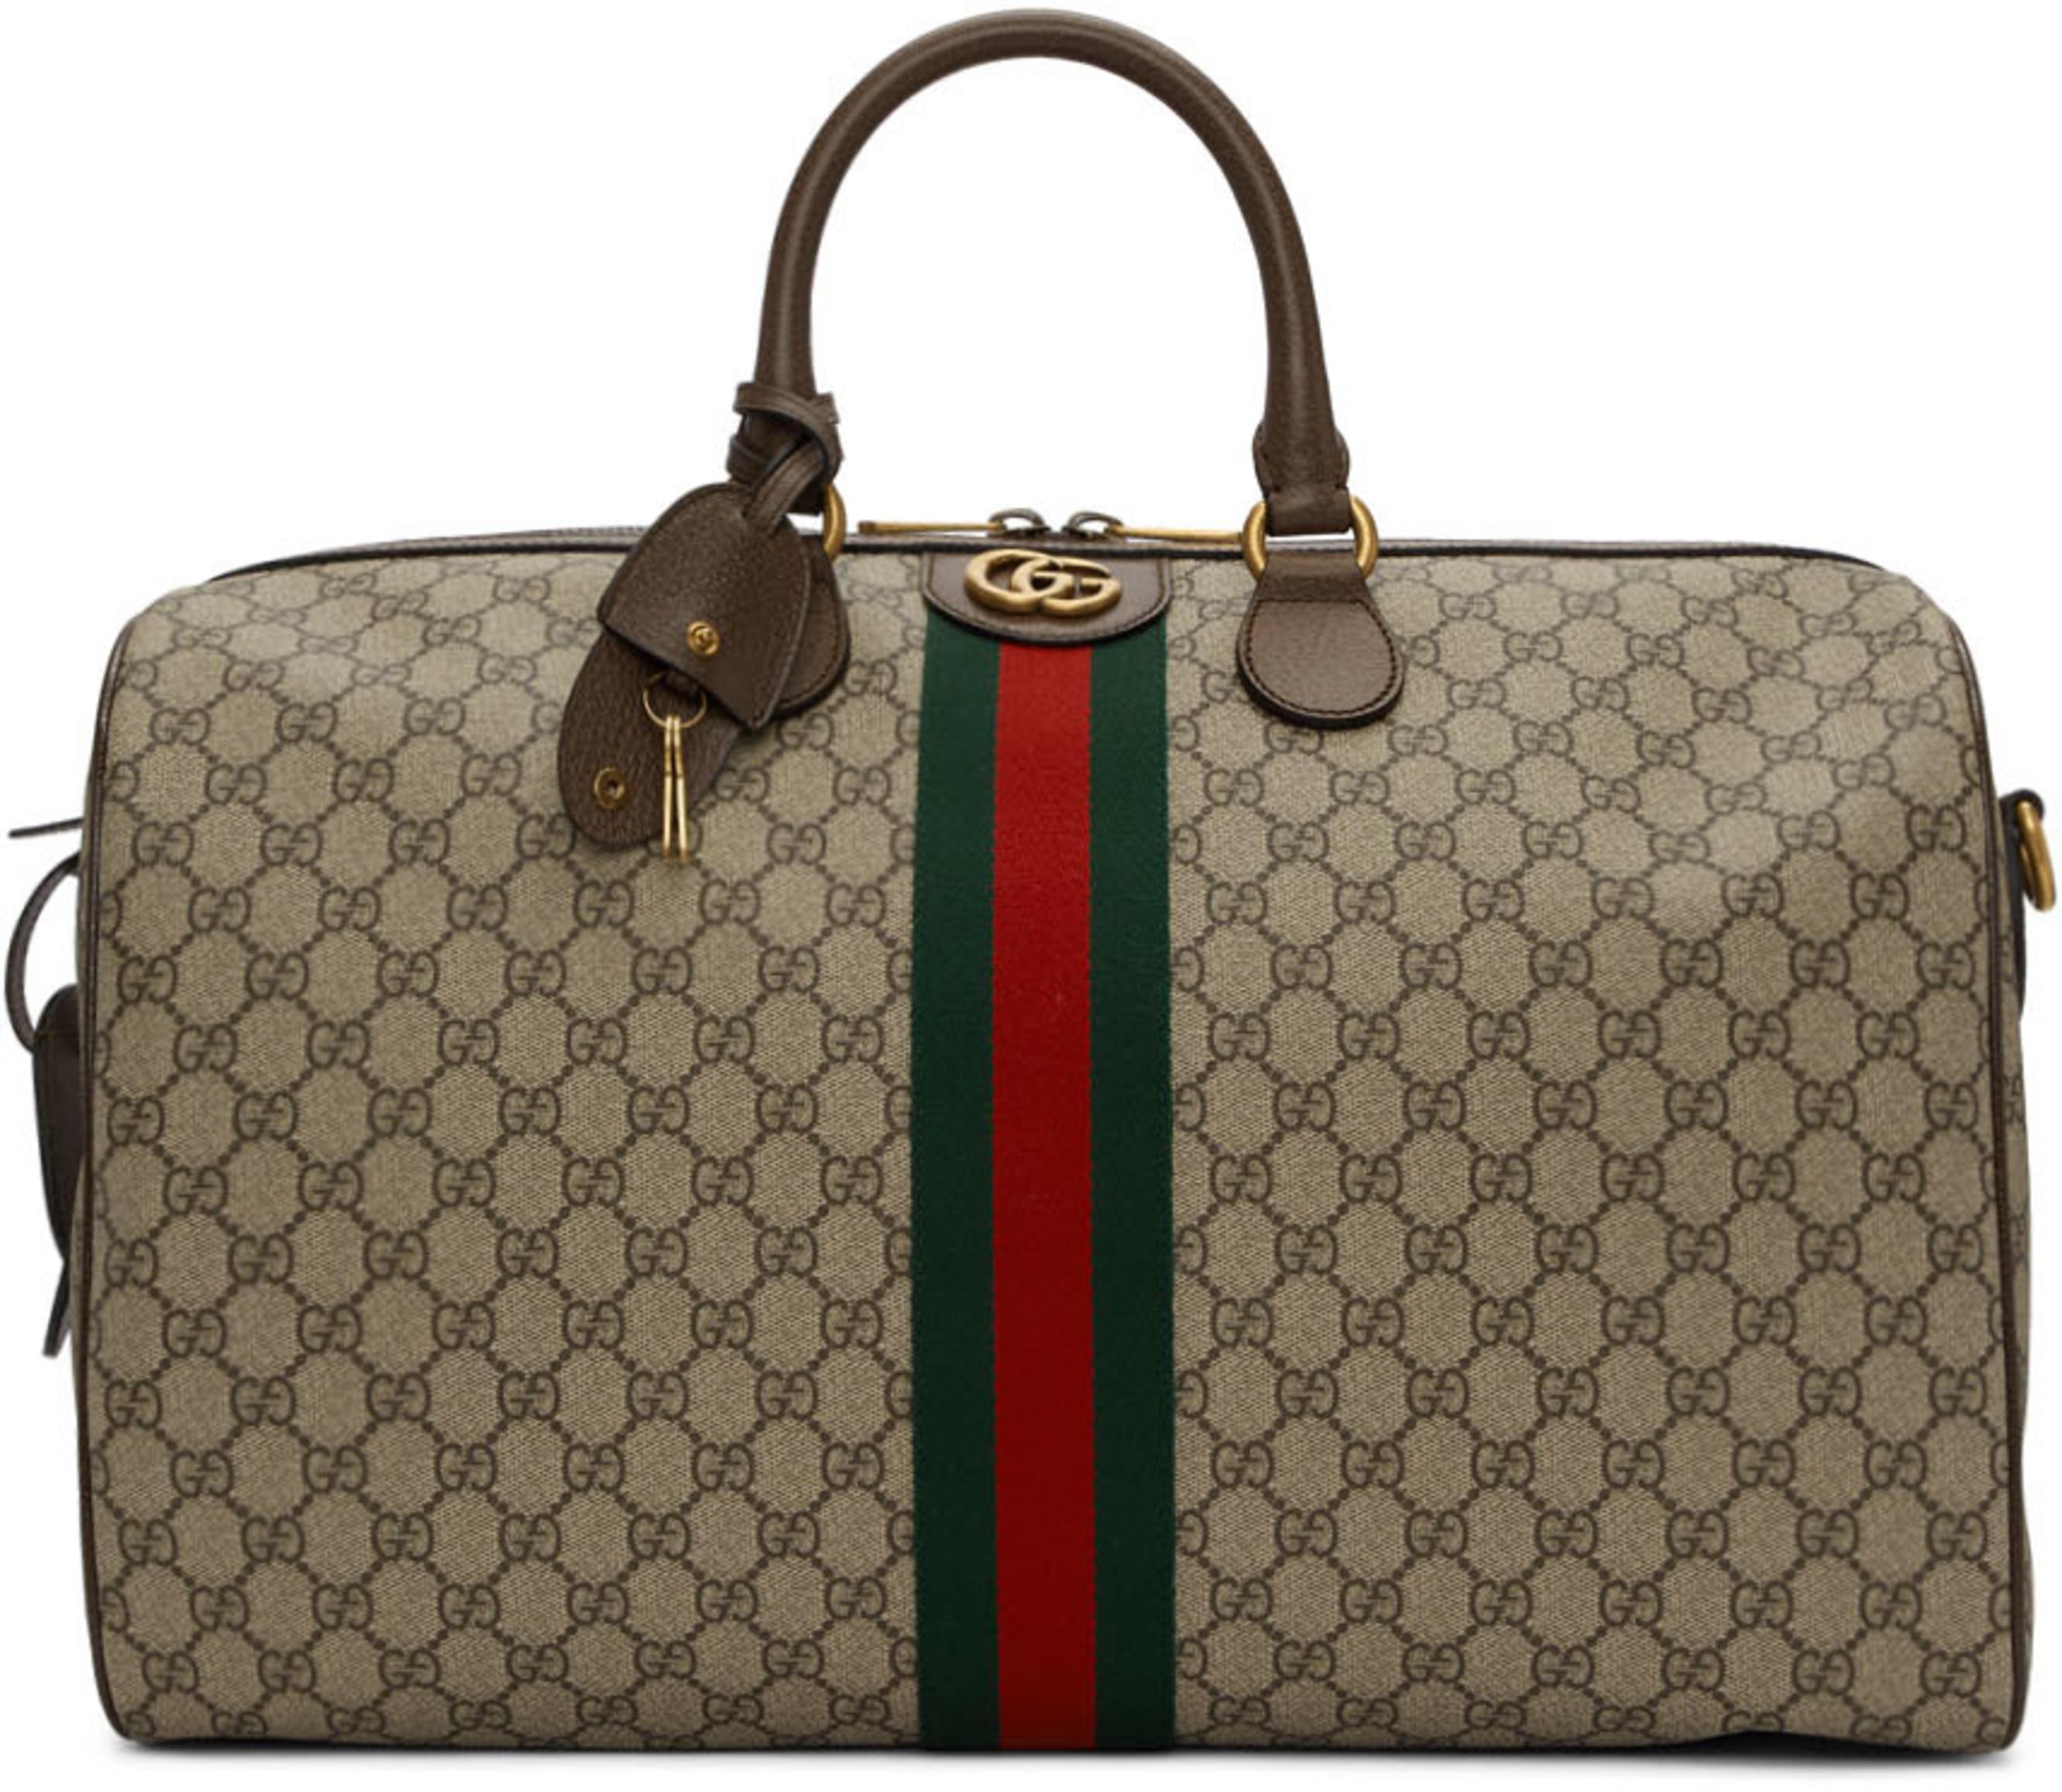 9877c7f31 Gucci bags for Women | SSENSE